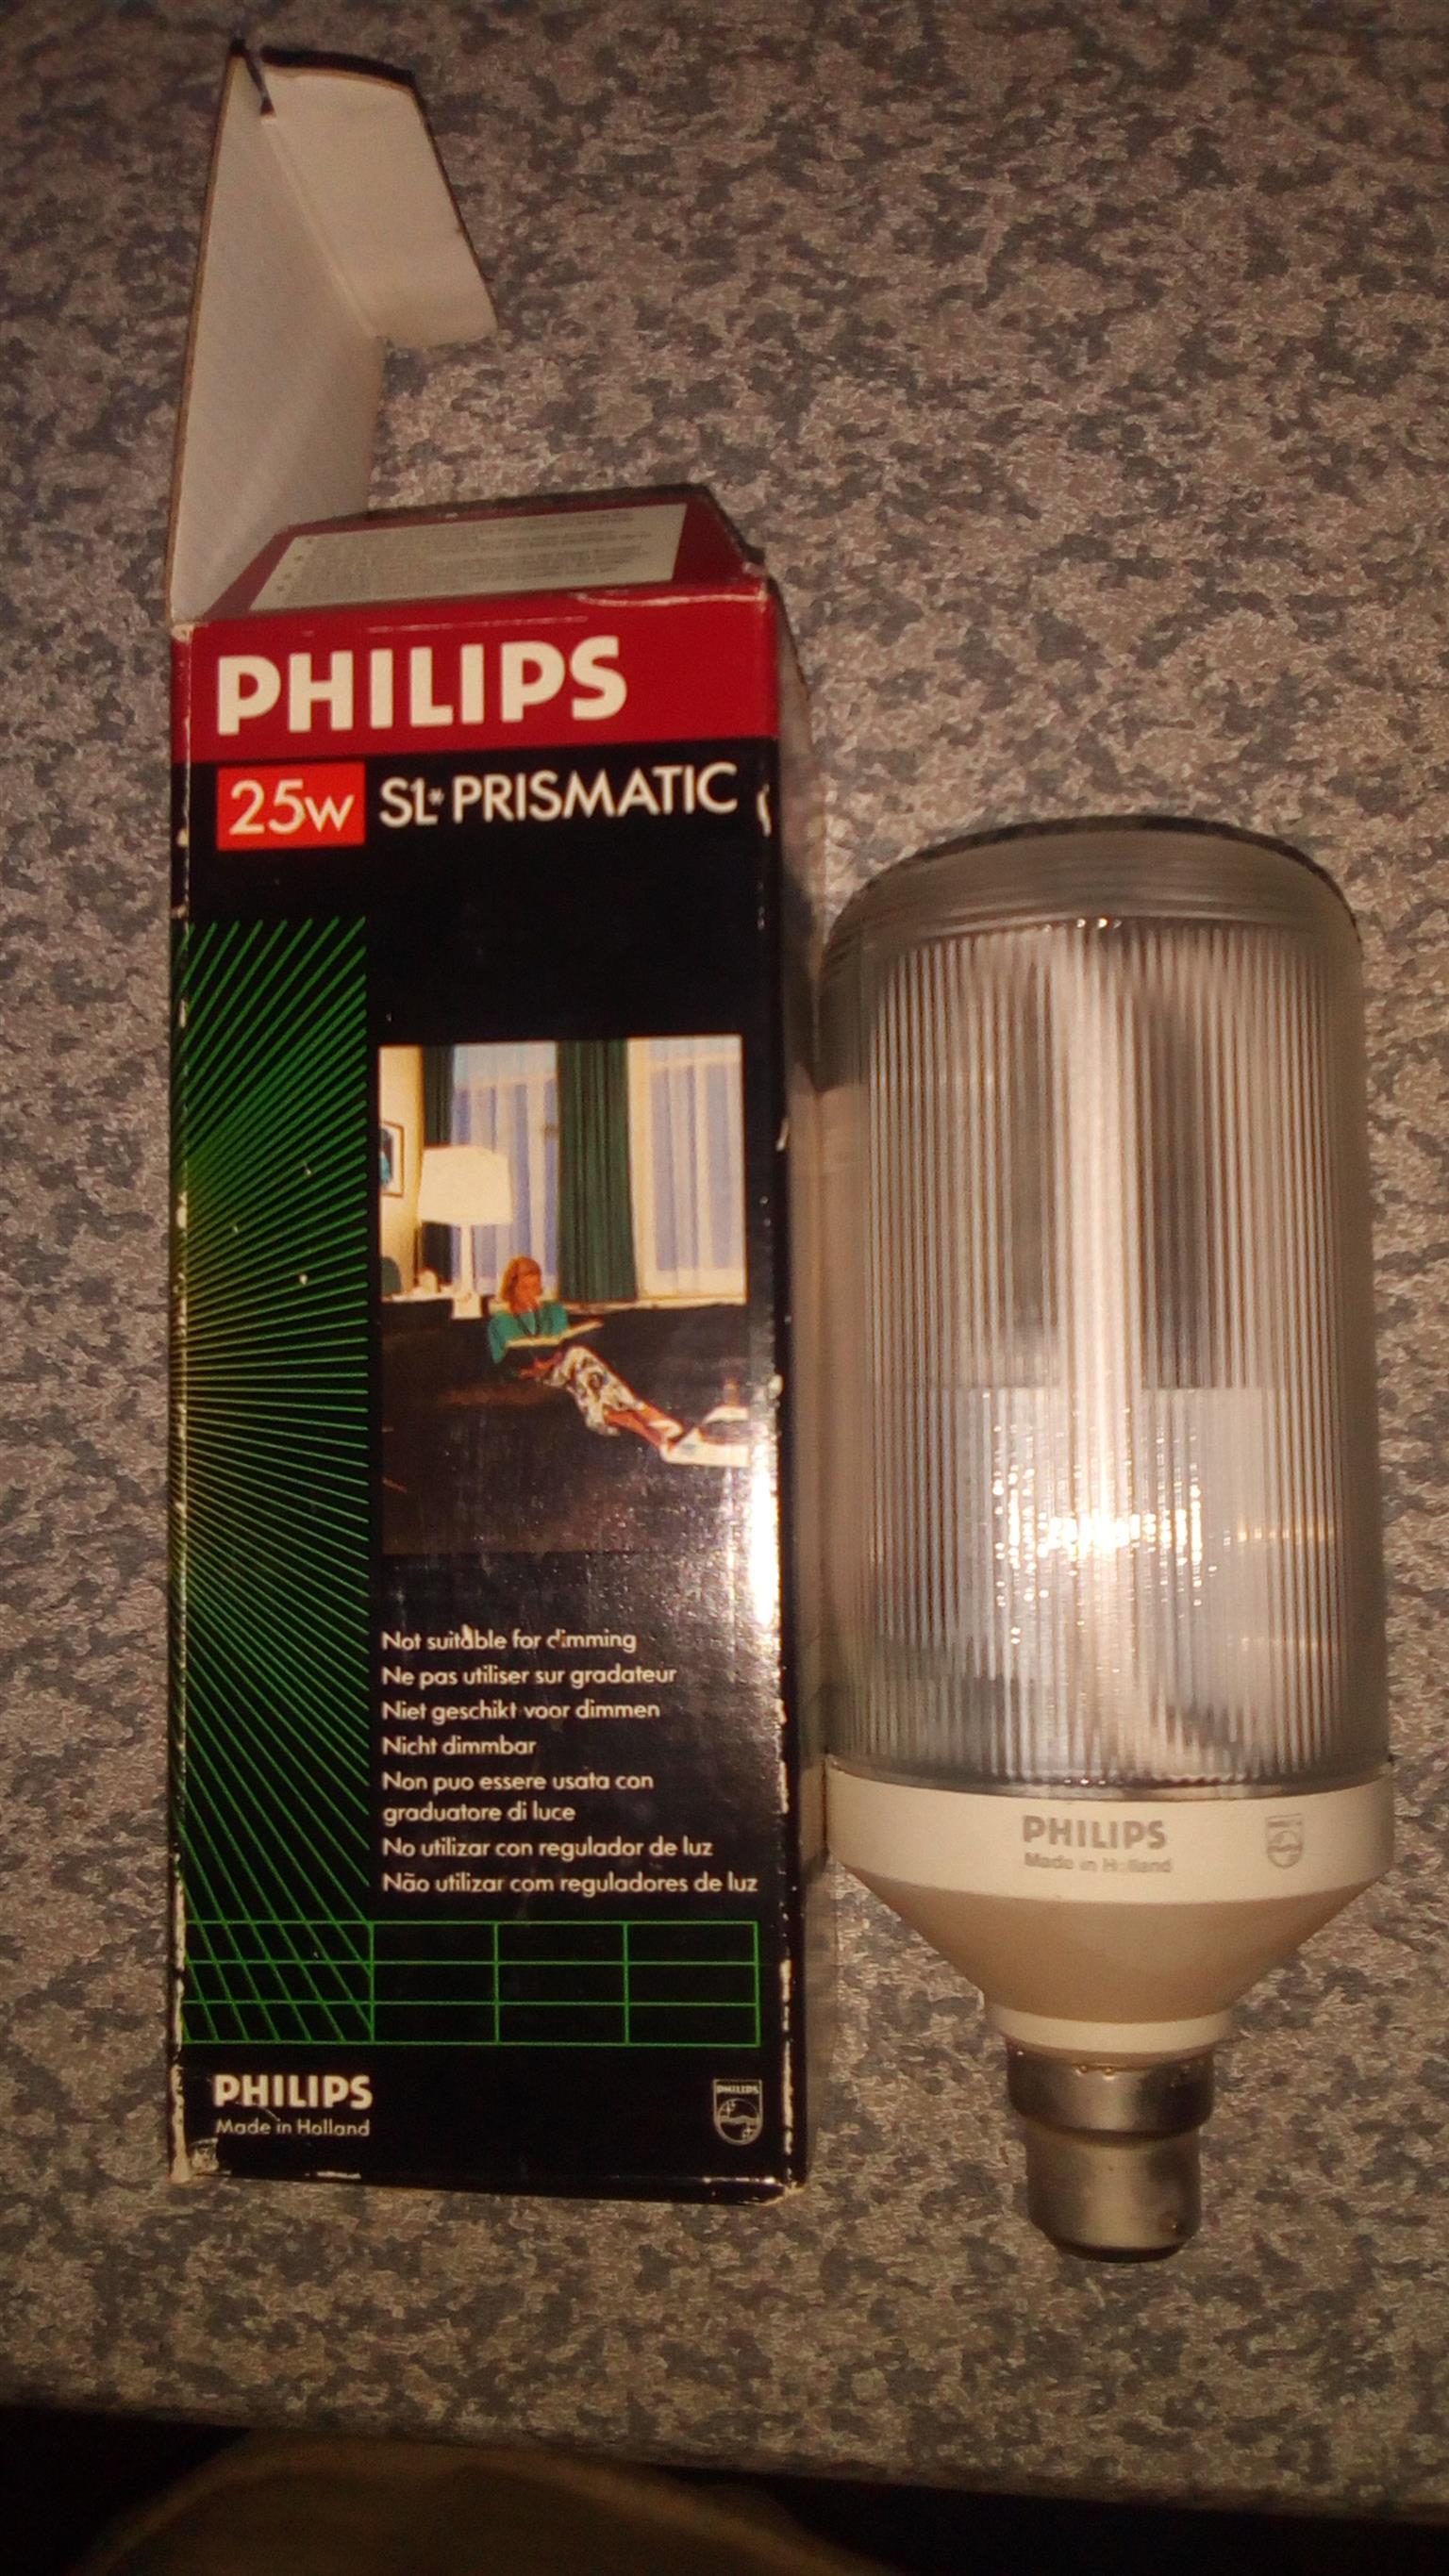 Philips - 25w - SL Prismatic light bulb